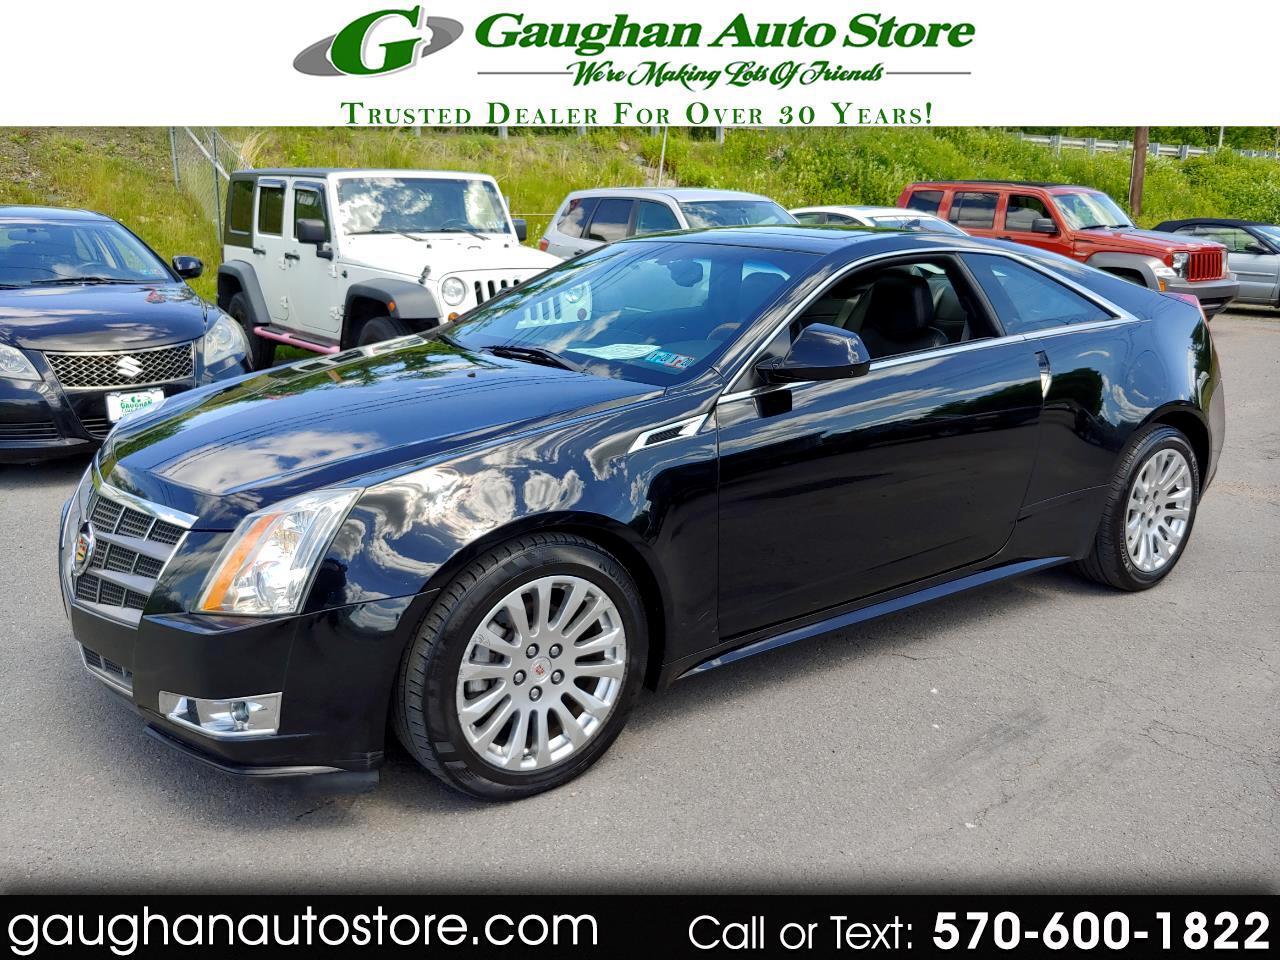 2011 Cadillac CTS Coupe AWD PREMIUM/LEATHER/MOONROOF/CAMERA/NAVI